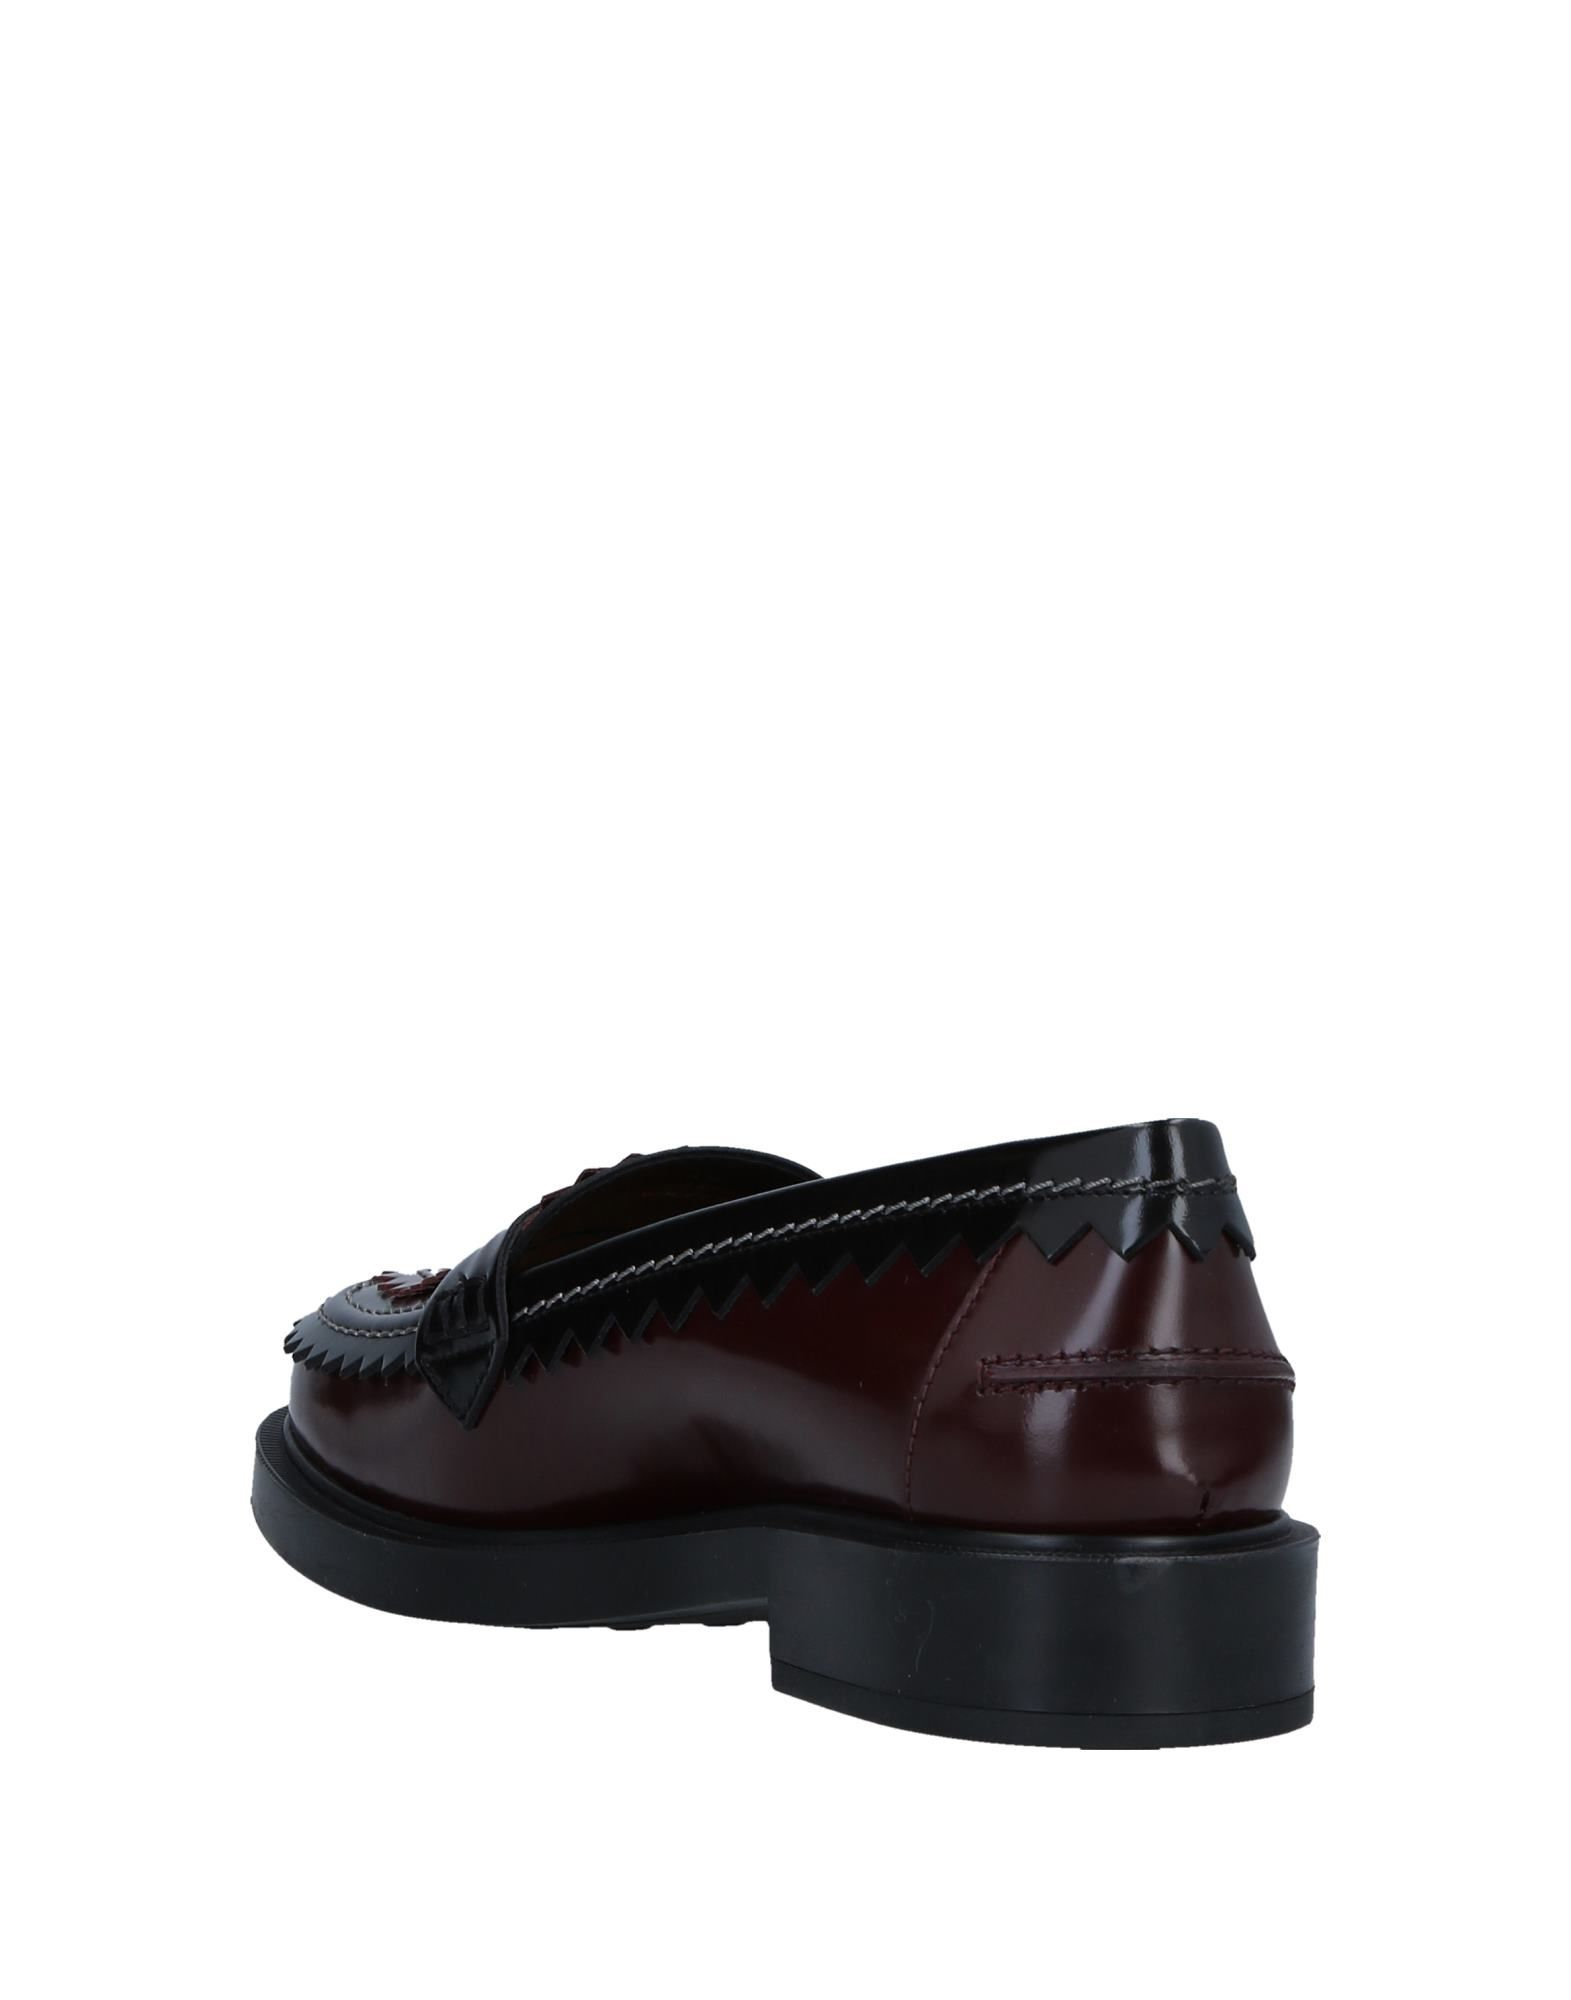 Rabatt Tod's Schuhe Tod's Rabatt Mokassins Damen  11542201FI 3a3b96